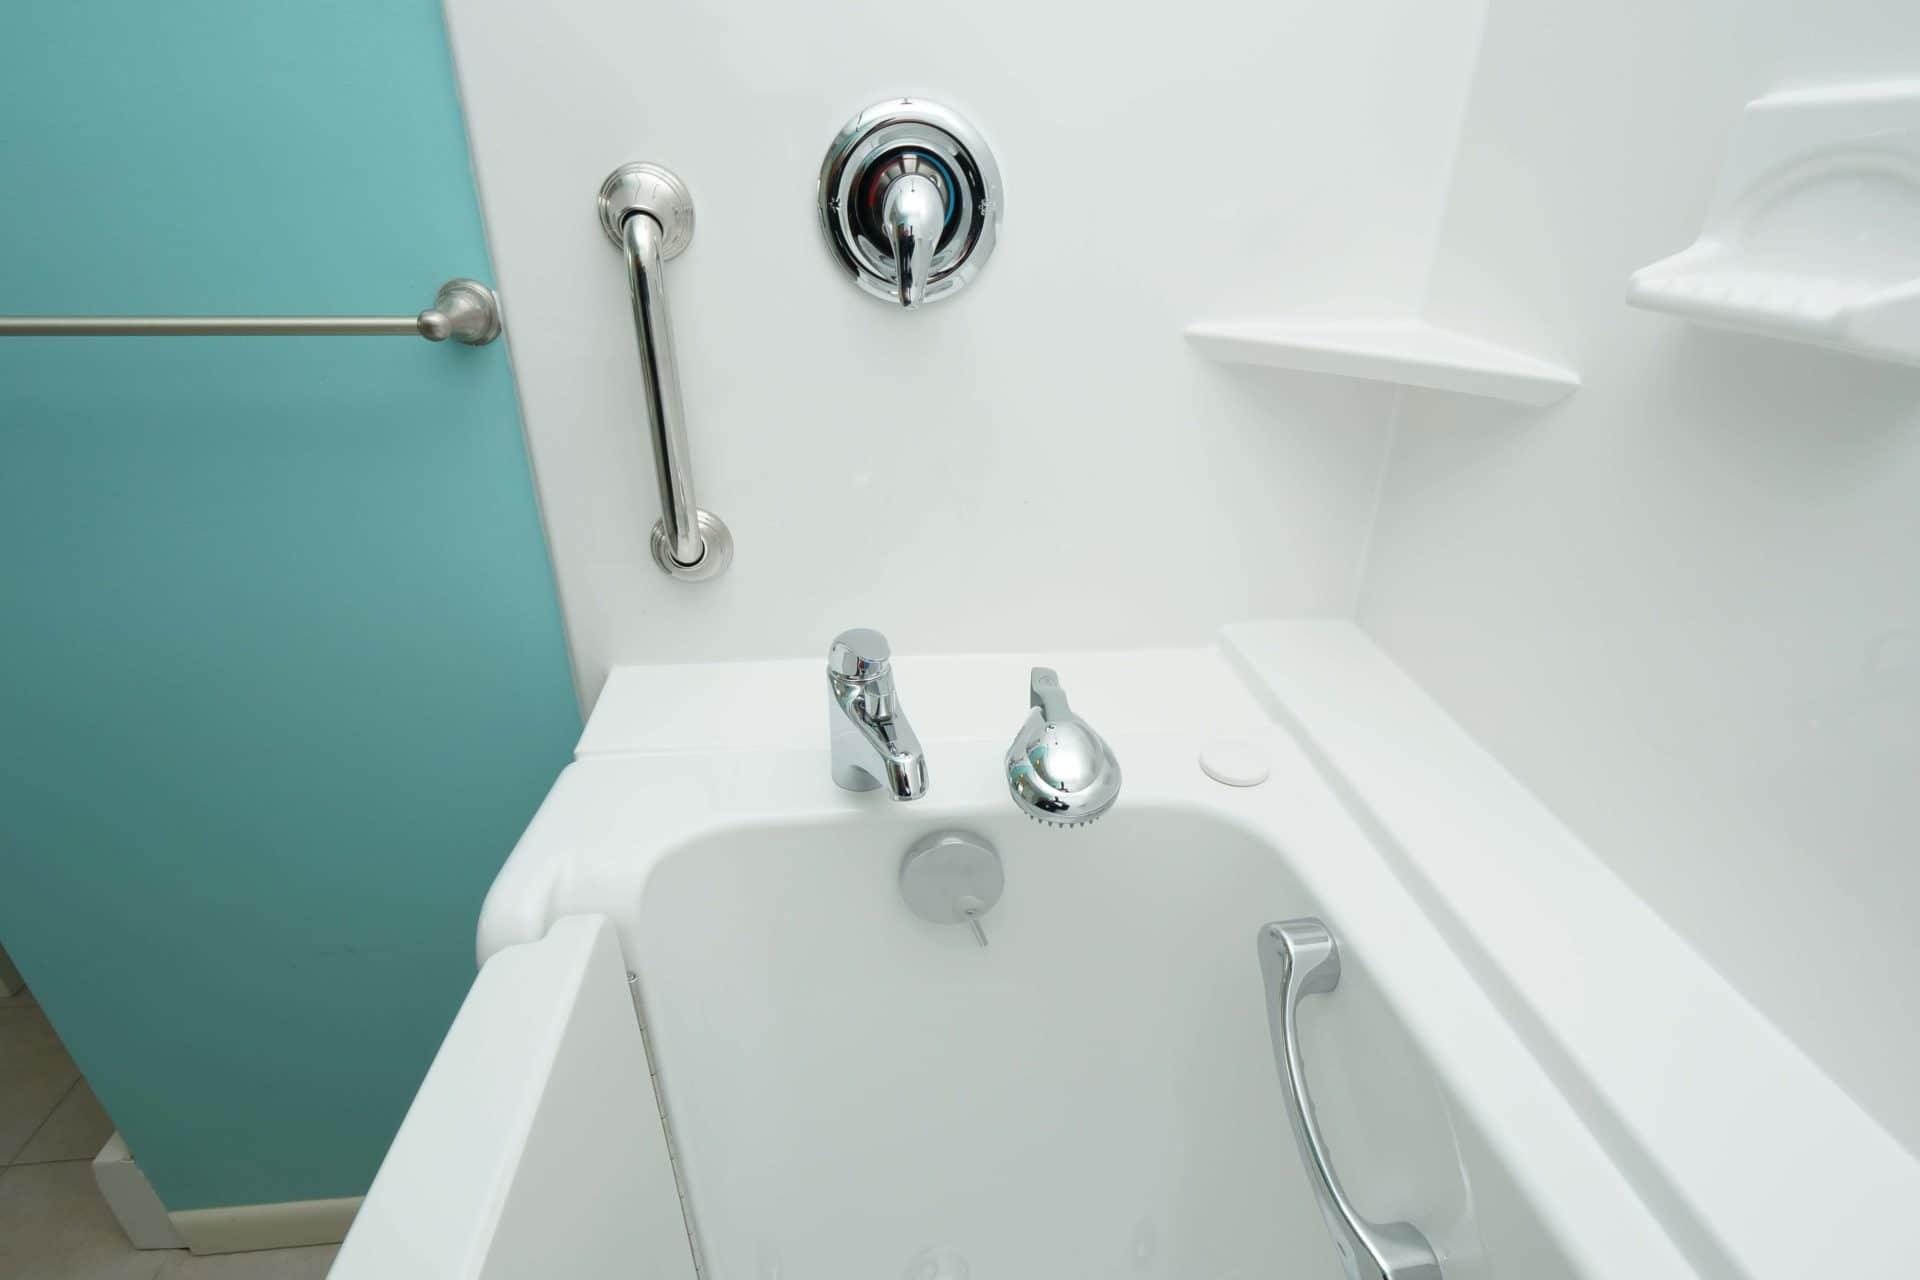 Bathroom Remodeling Clearwater FL West Shore Home - Bathroom remodel sweepstakes